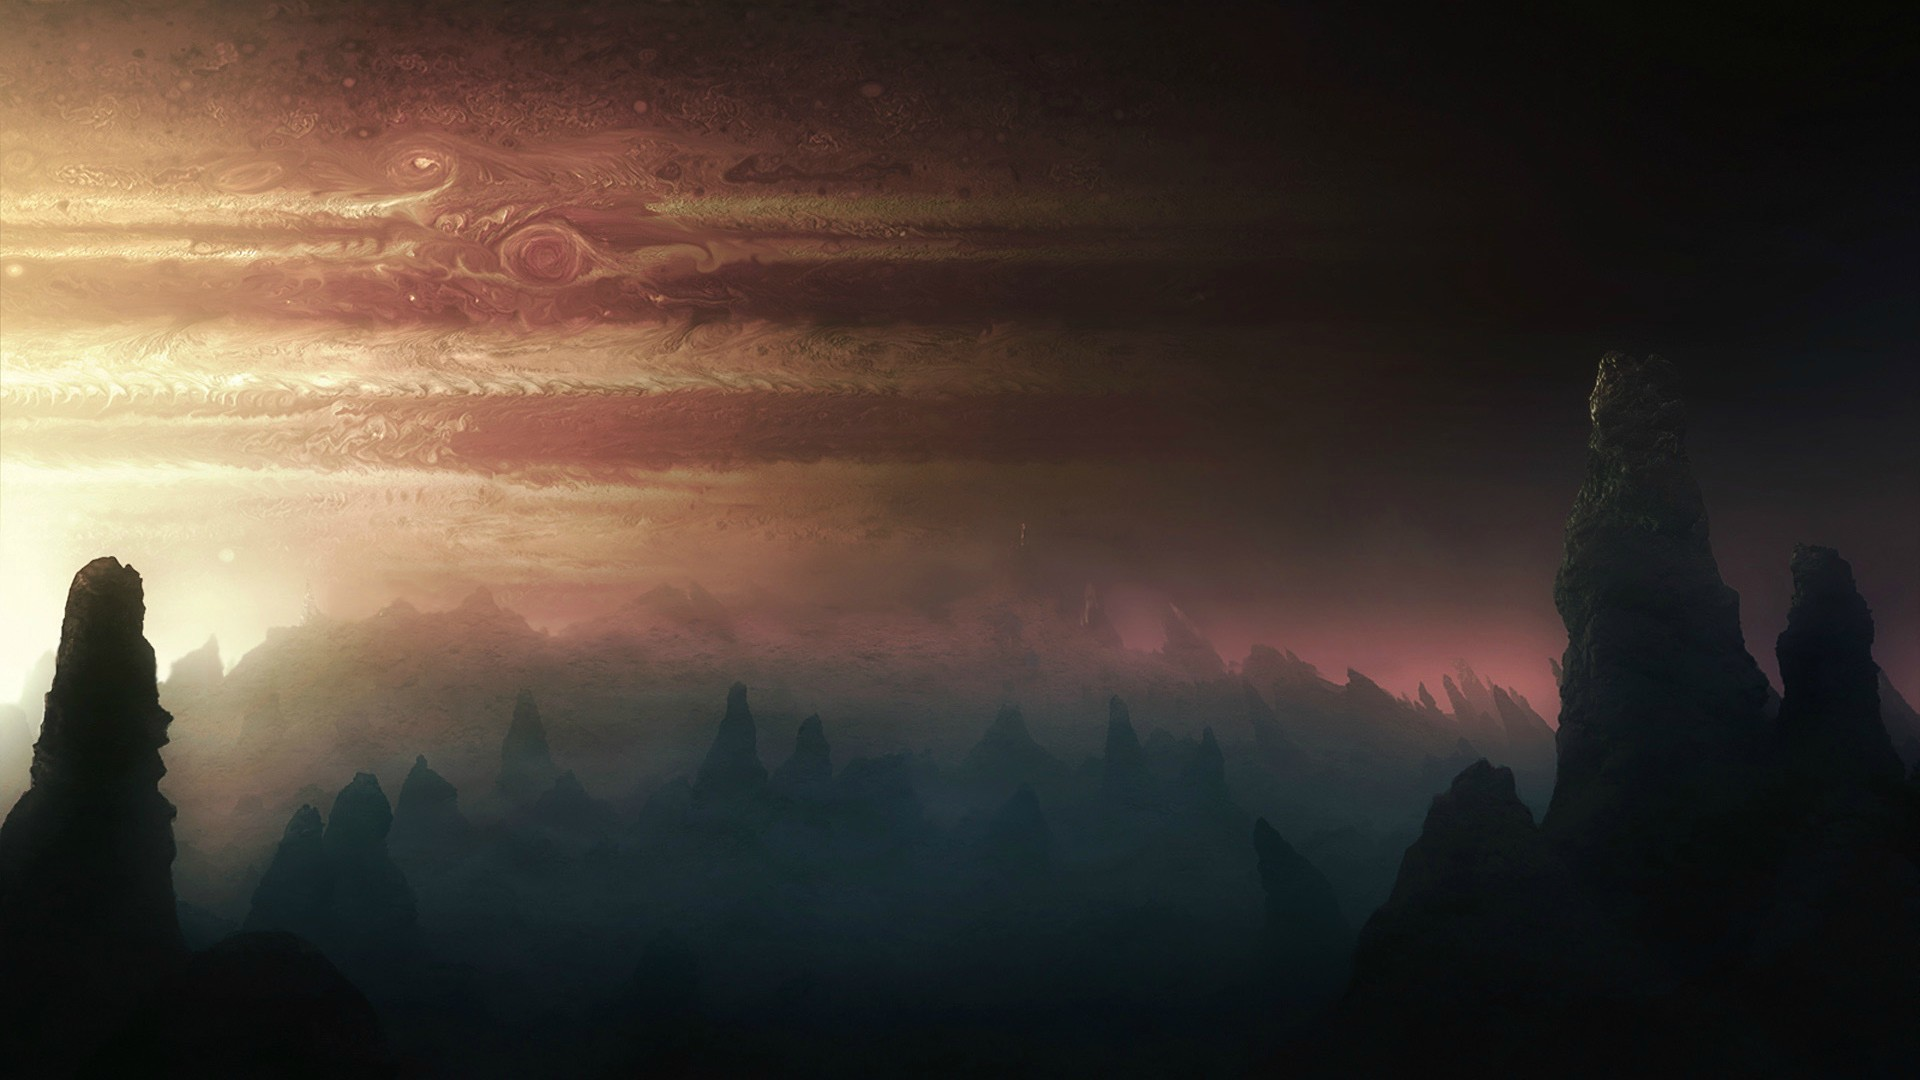 Jupiter Planet Alien Landscape wallpaper | | 218940 | WallpaperUP